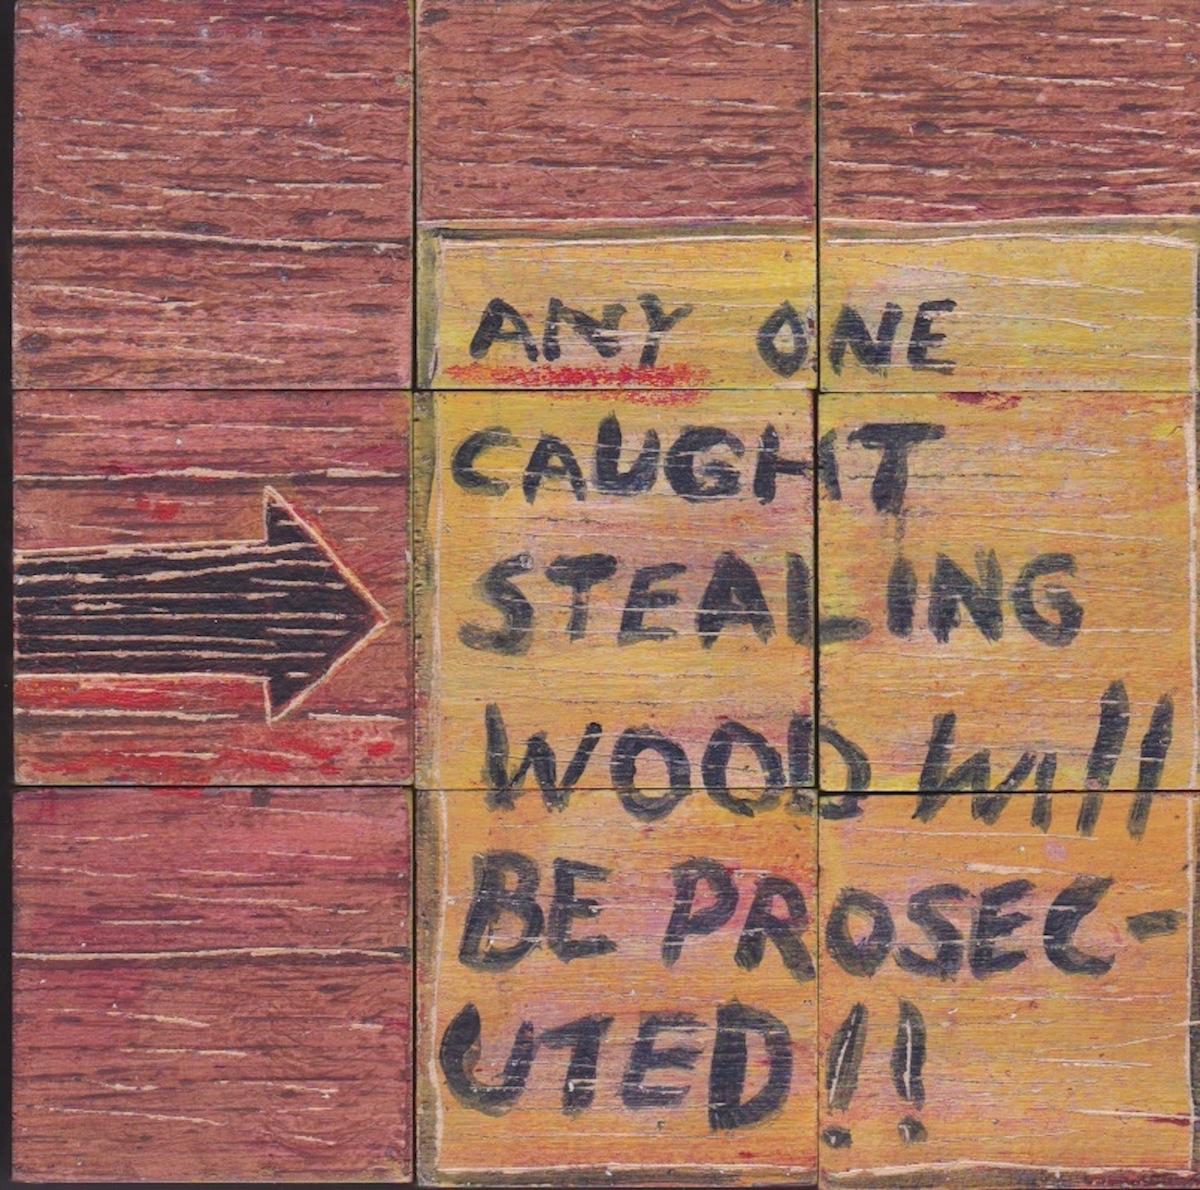 Stealing Wood6.72.jpeg